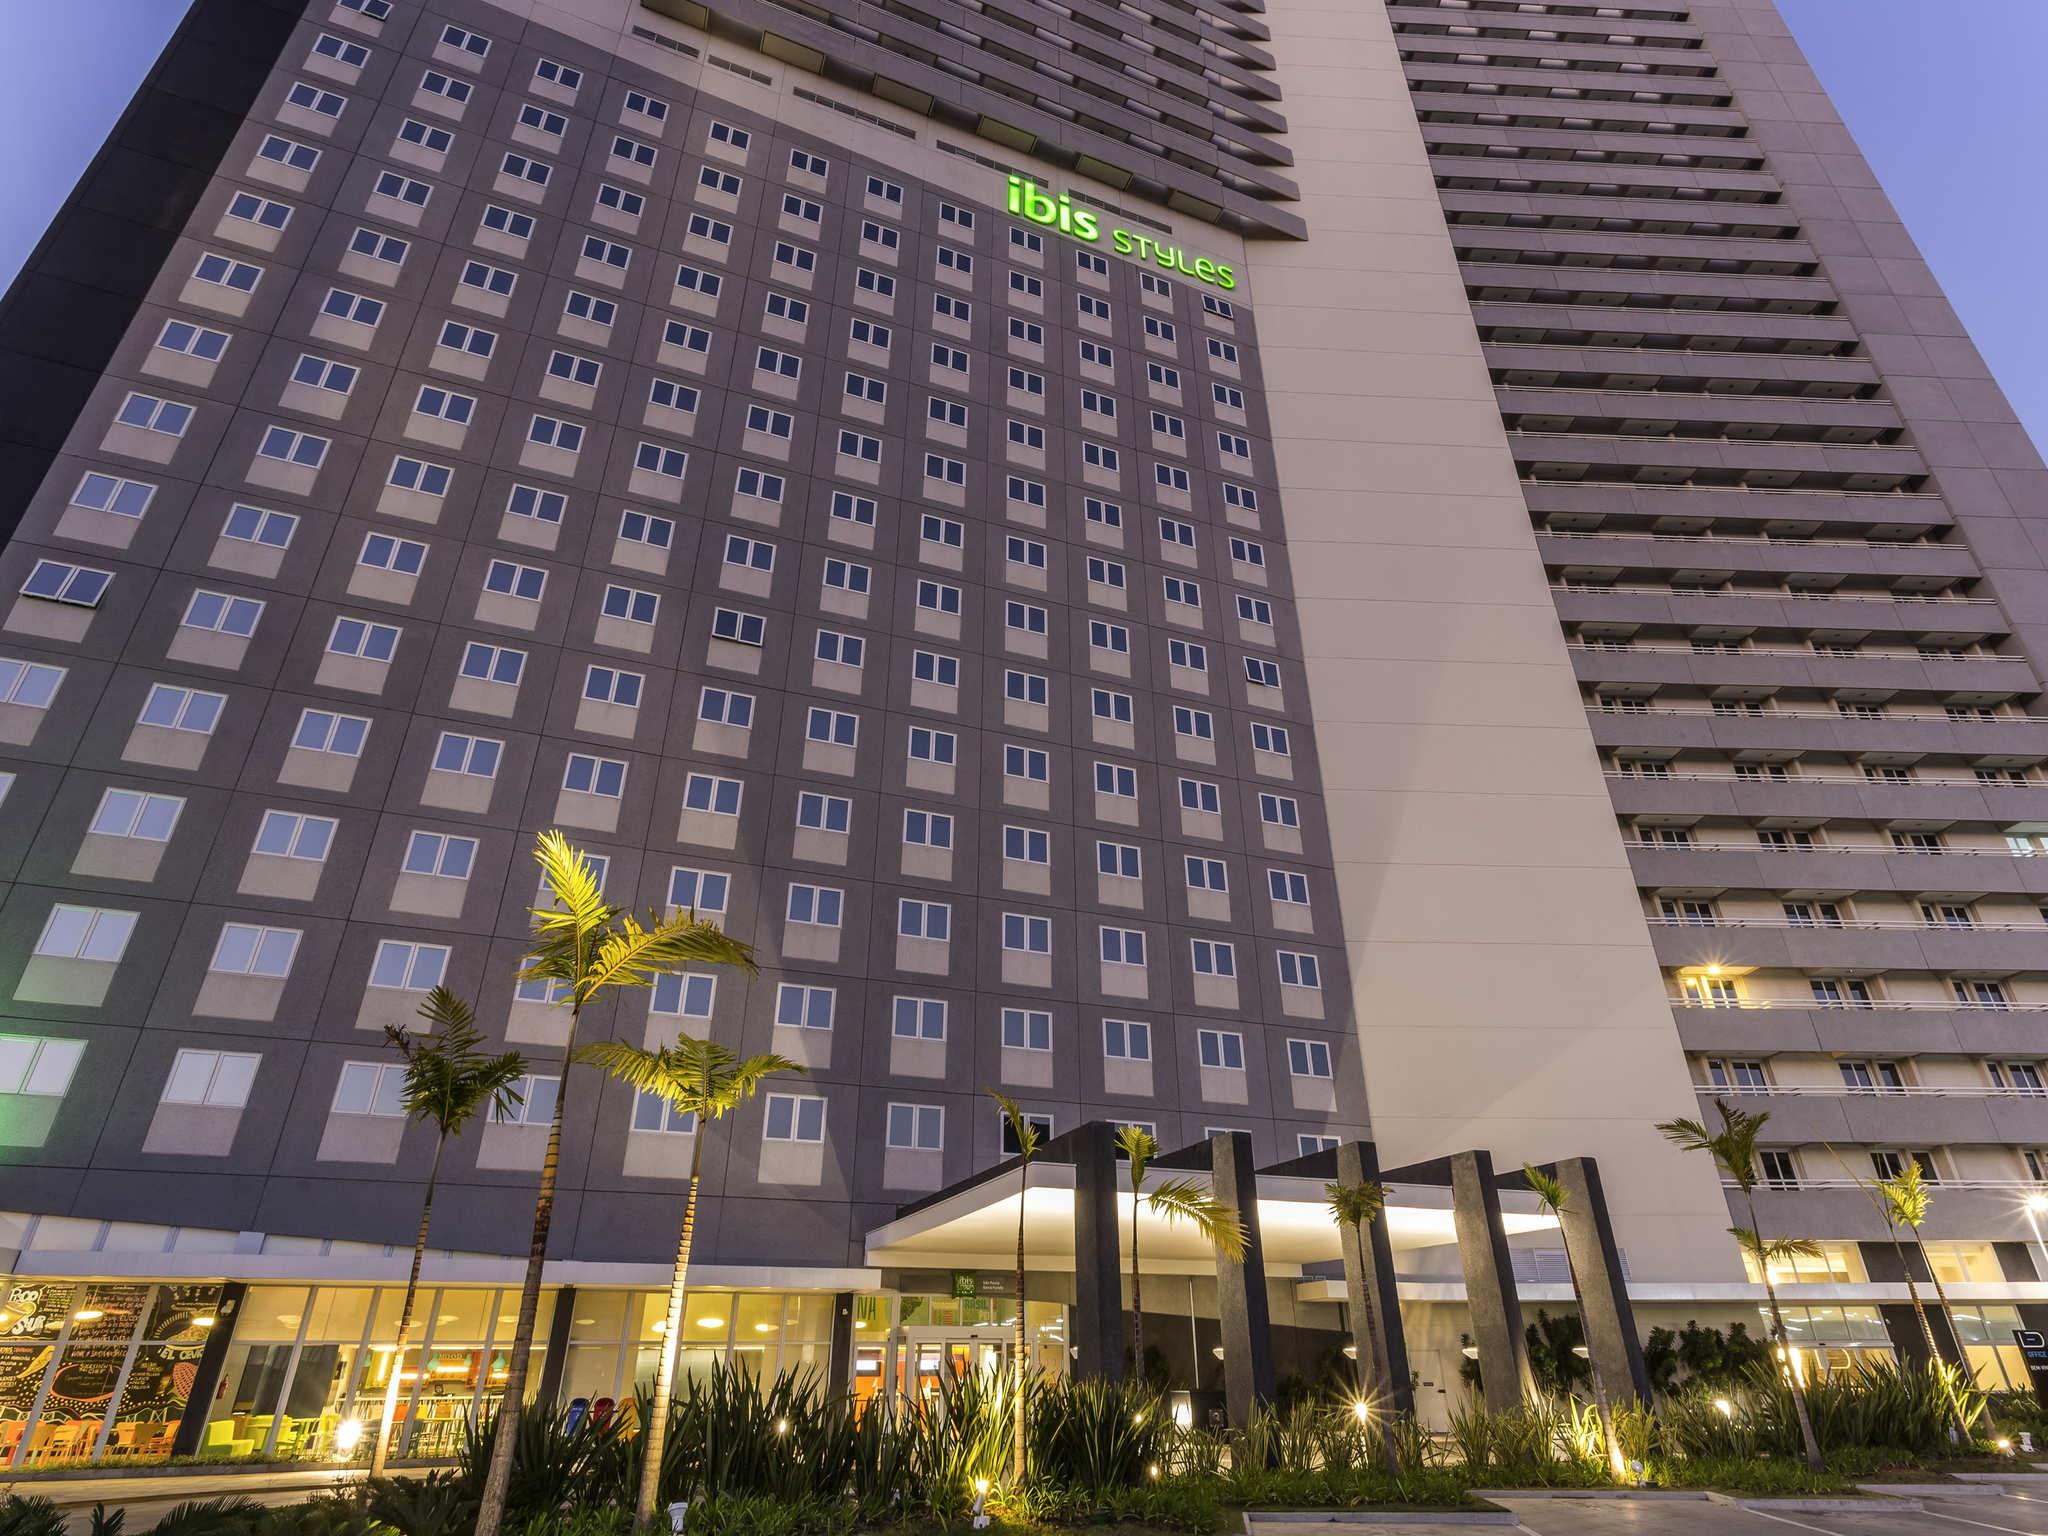 Hotel - ibis Styles Sao Paulo Barra Funda